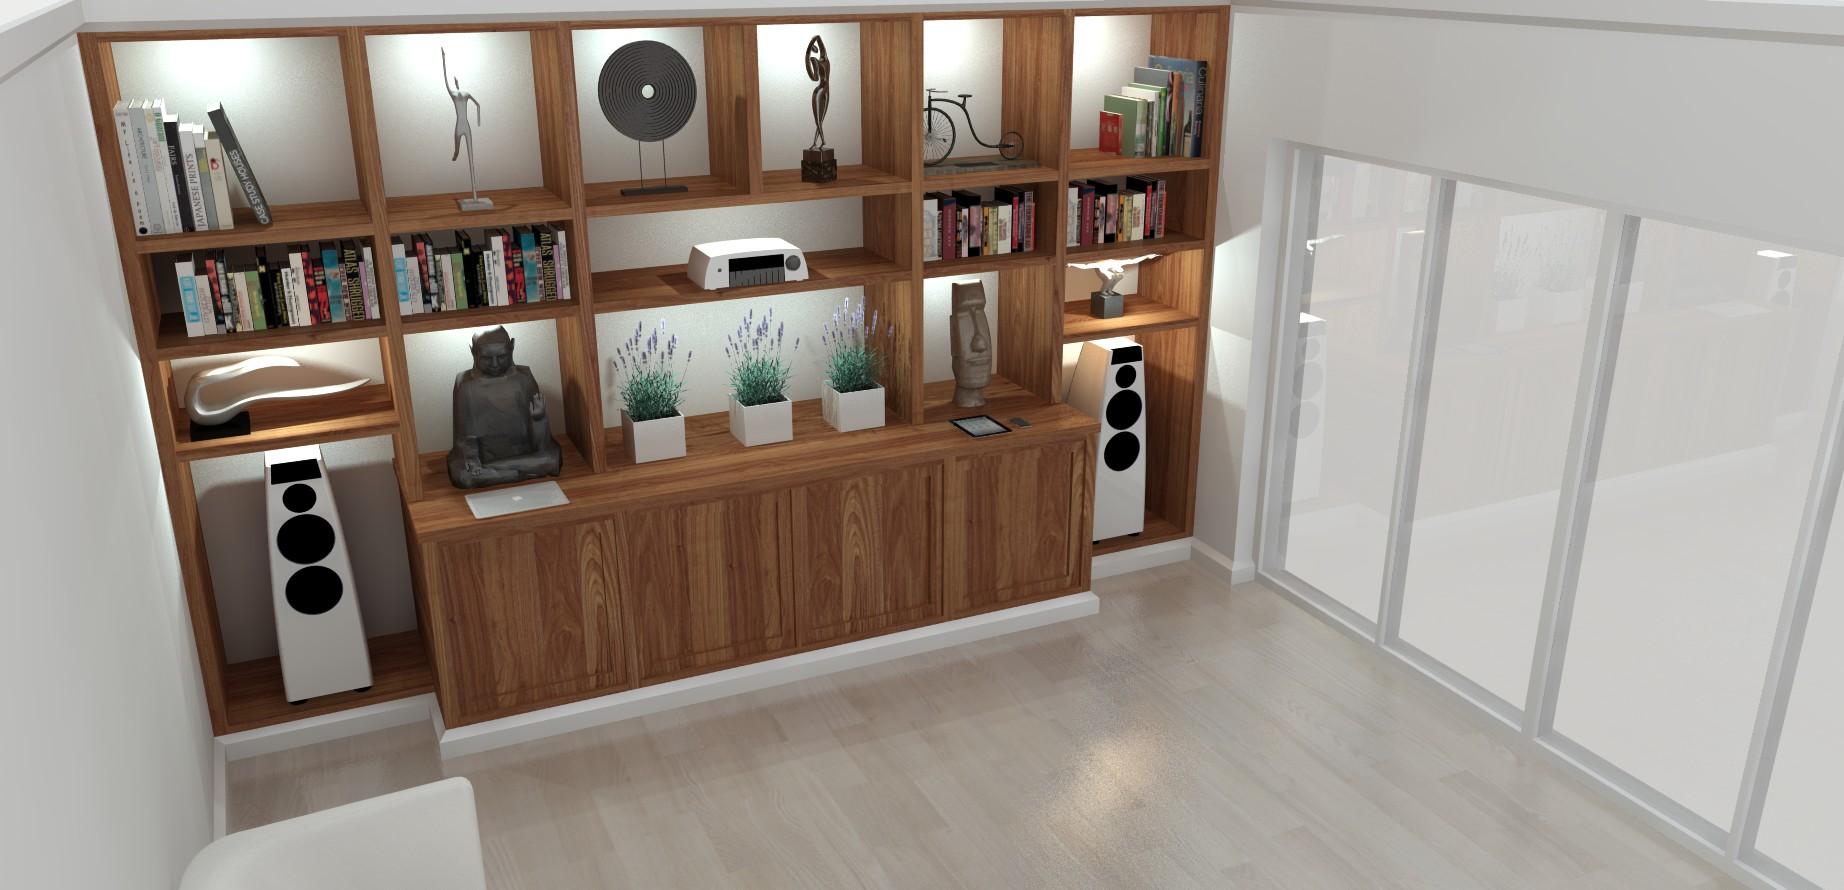 Edwardian Glass House - Library 3D Design